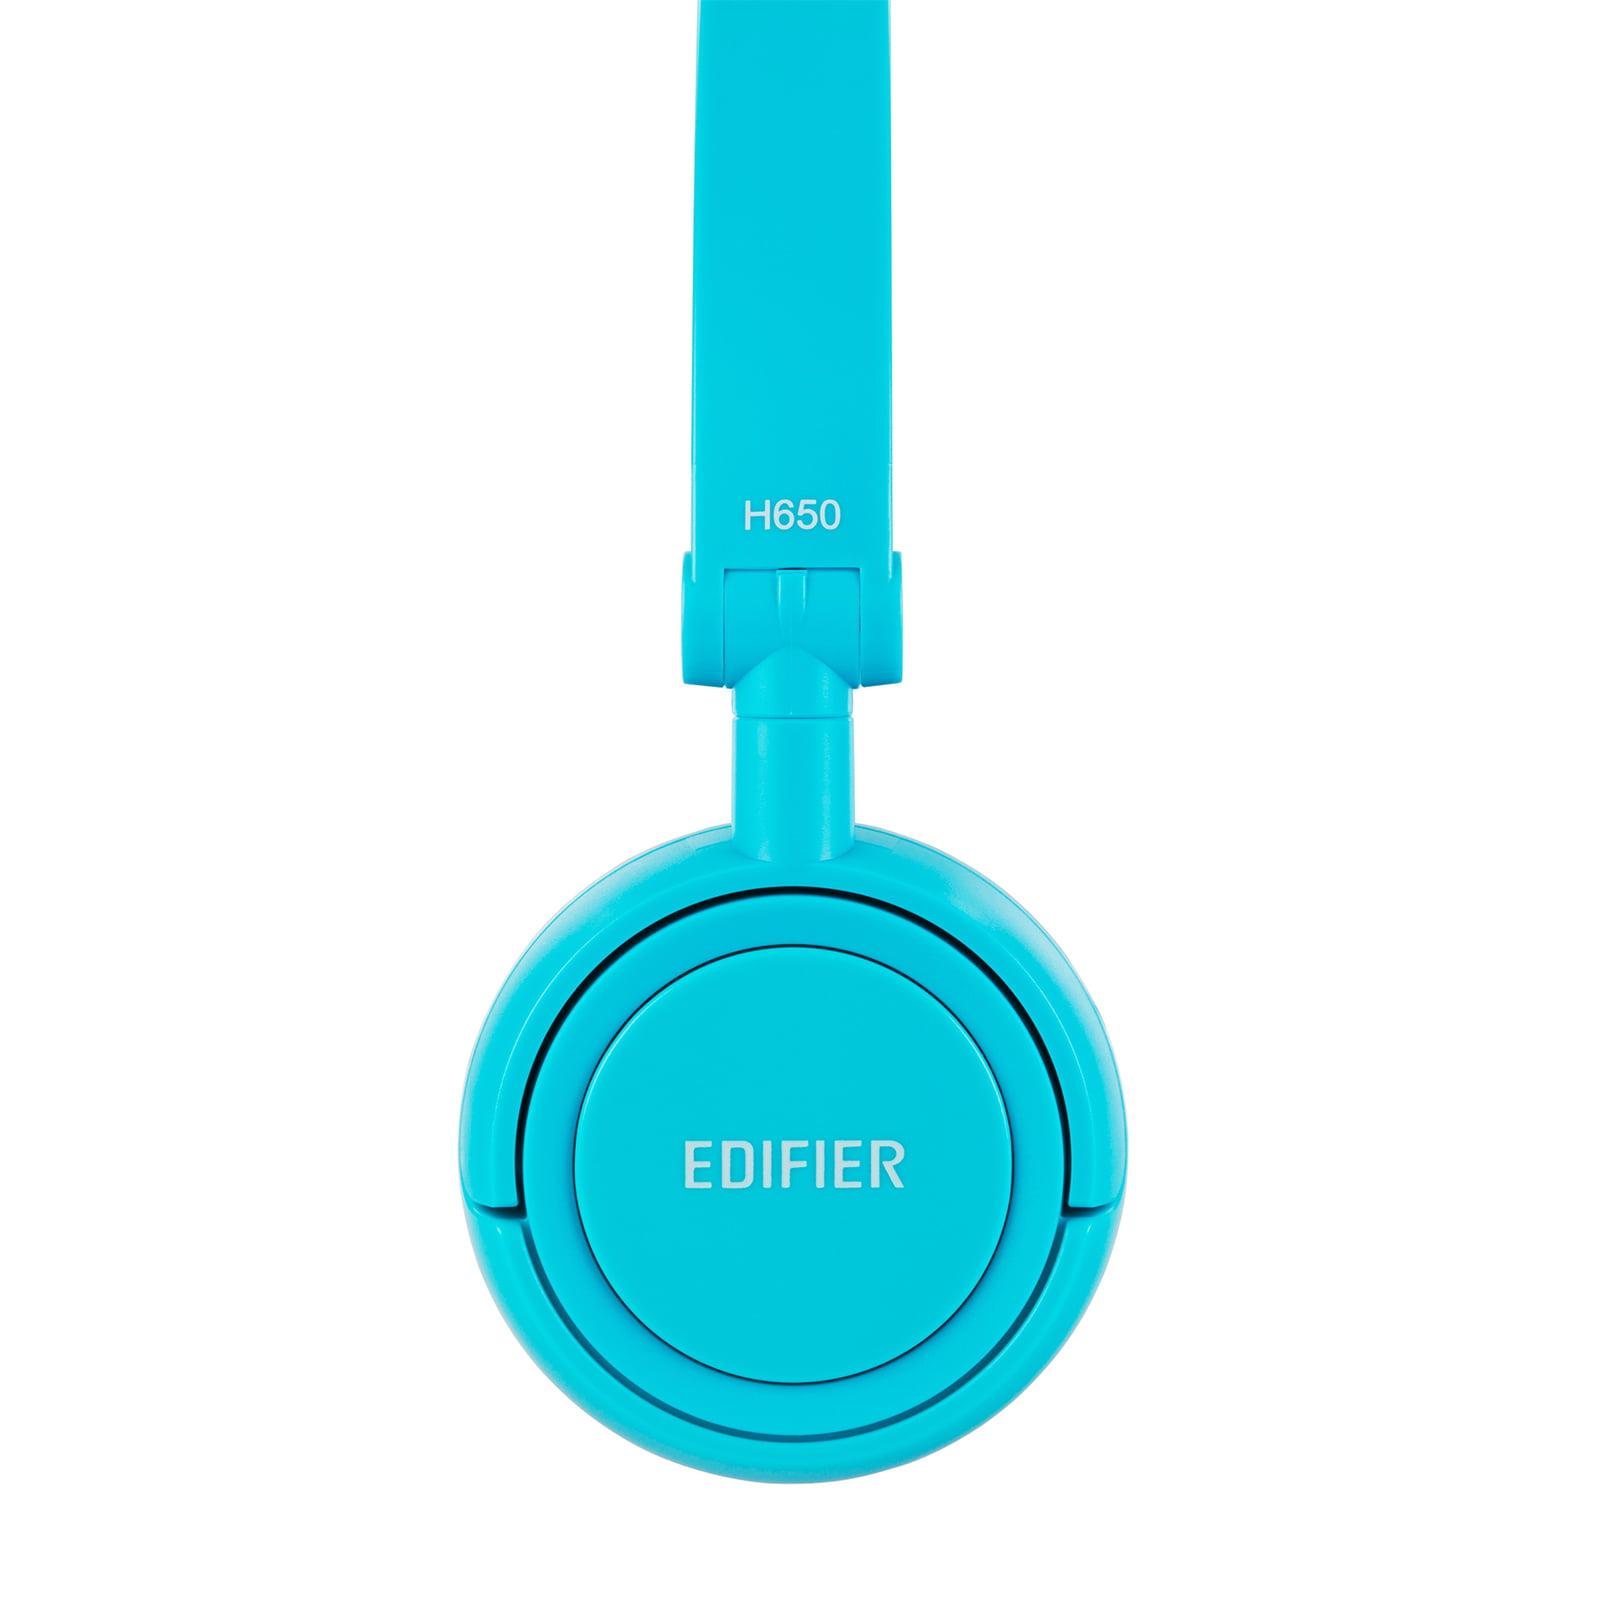 Edifier H650 Headphones - Hi-Fi On-Ear Foldable Noise-Isolating Stereo Headphone, Ultralight and Tri-fold Portable - Blue - image 2 of 7